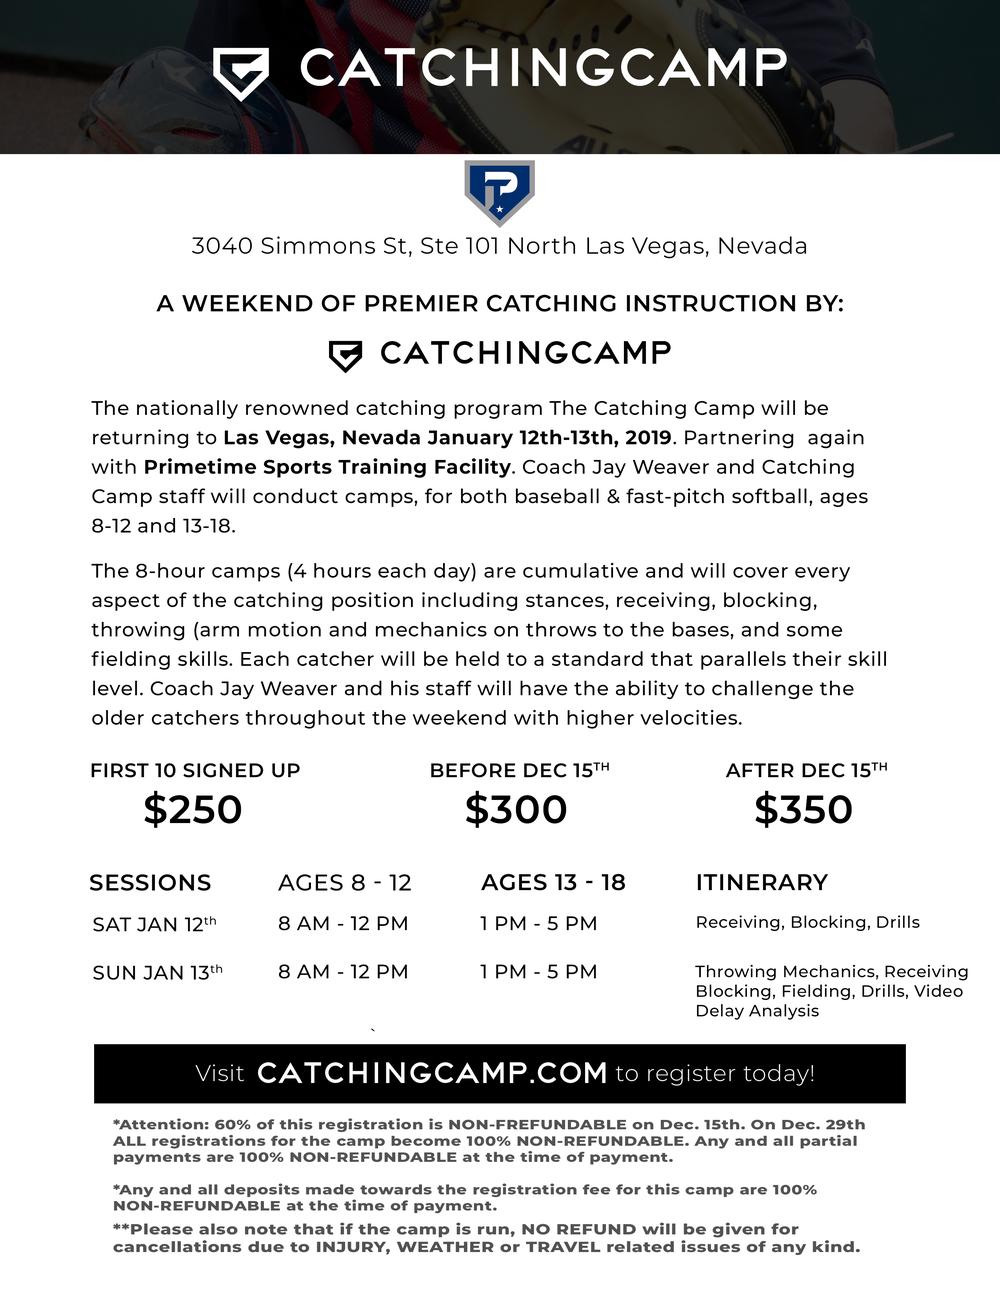 CC_Roadtrip_CampFlyer_Template_Vegas_2018.png